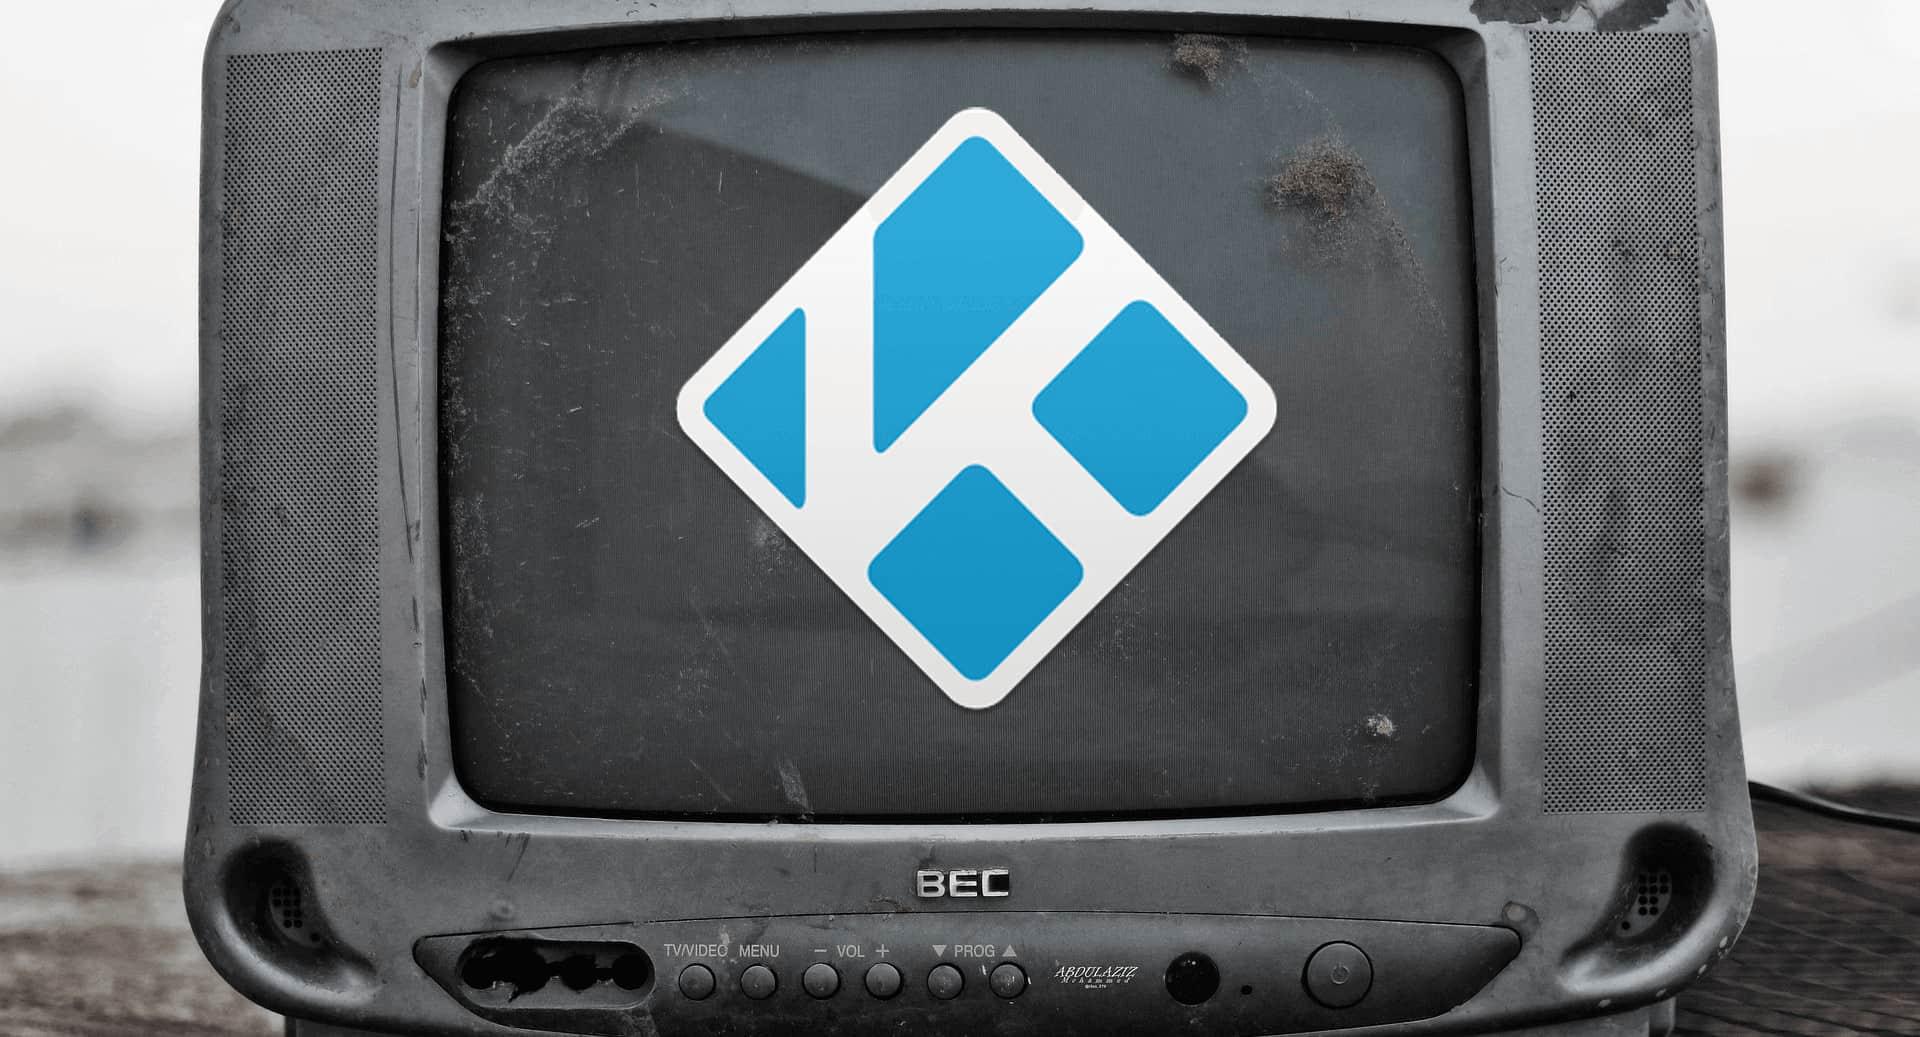 6 Best Legal Kodi TV Show Addons 2017 hero